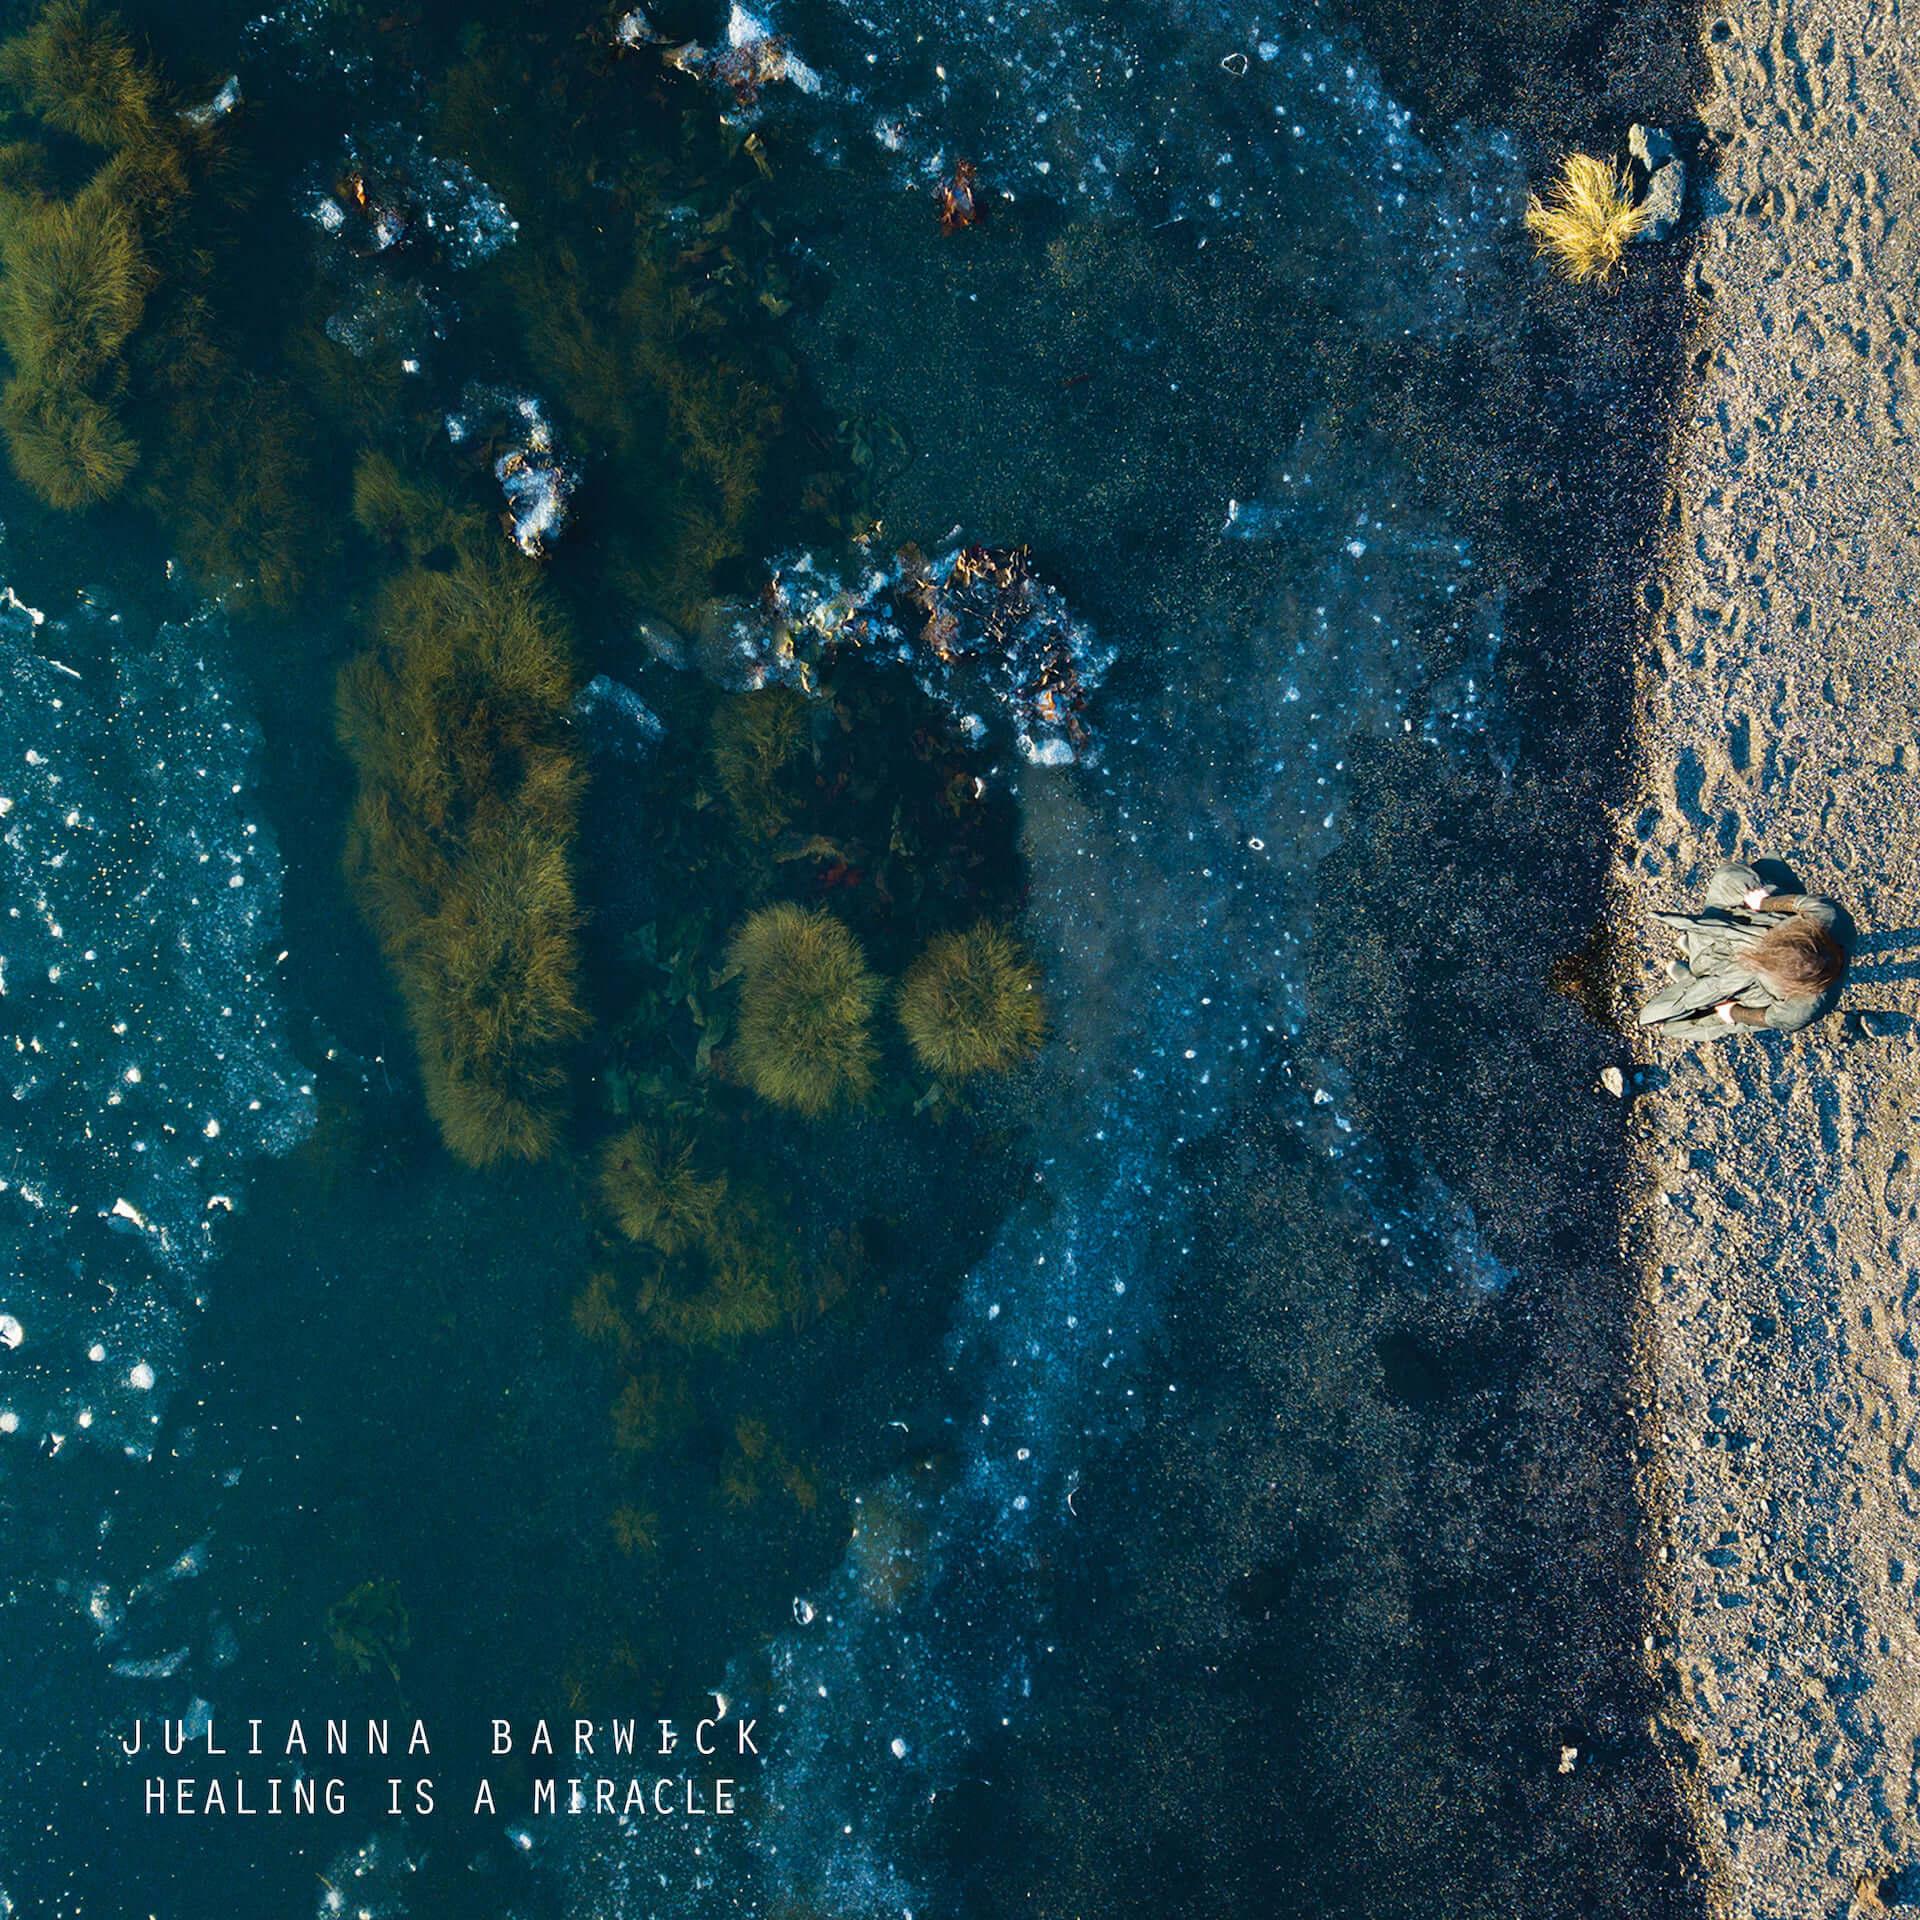 Sigur Rós・Jónsiらを迎えたJulianna Barwickの新アルバムが〈Ninja Tune〉よりリリース決定|瞑想サウンドを紡いだ新曲のMVも公開 music200521_julianna_barwick_2-1920x1920